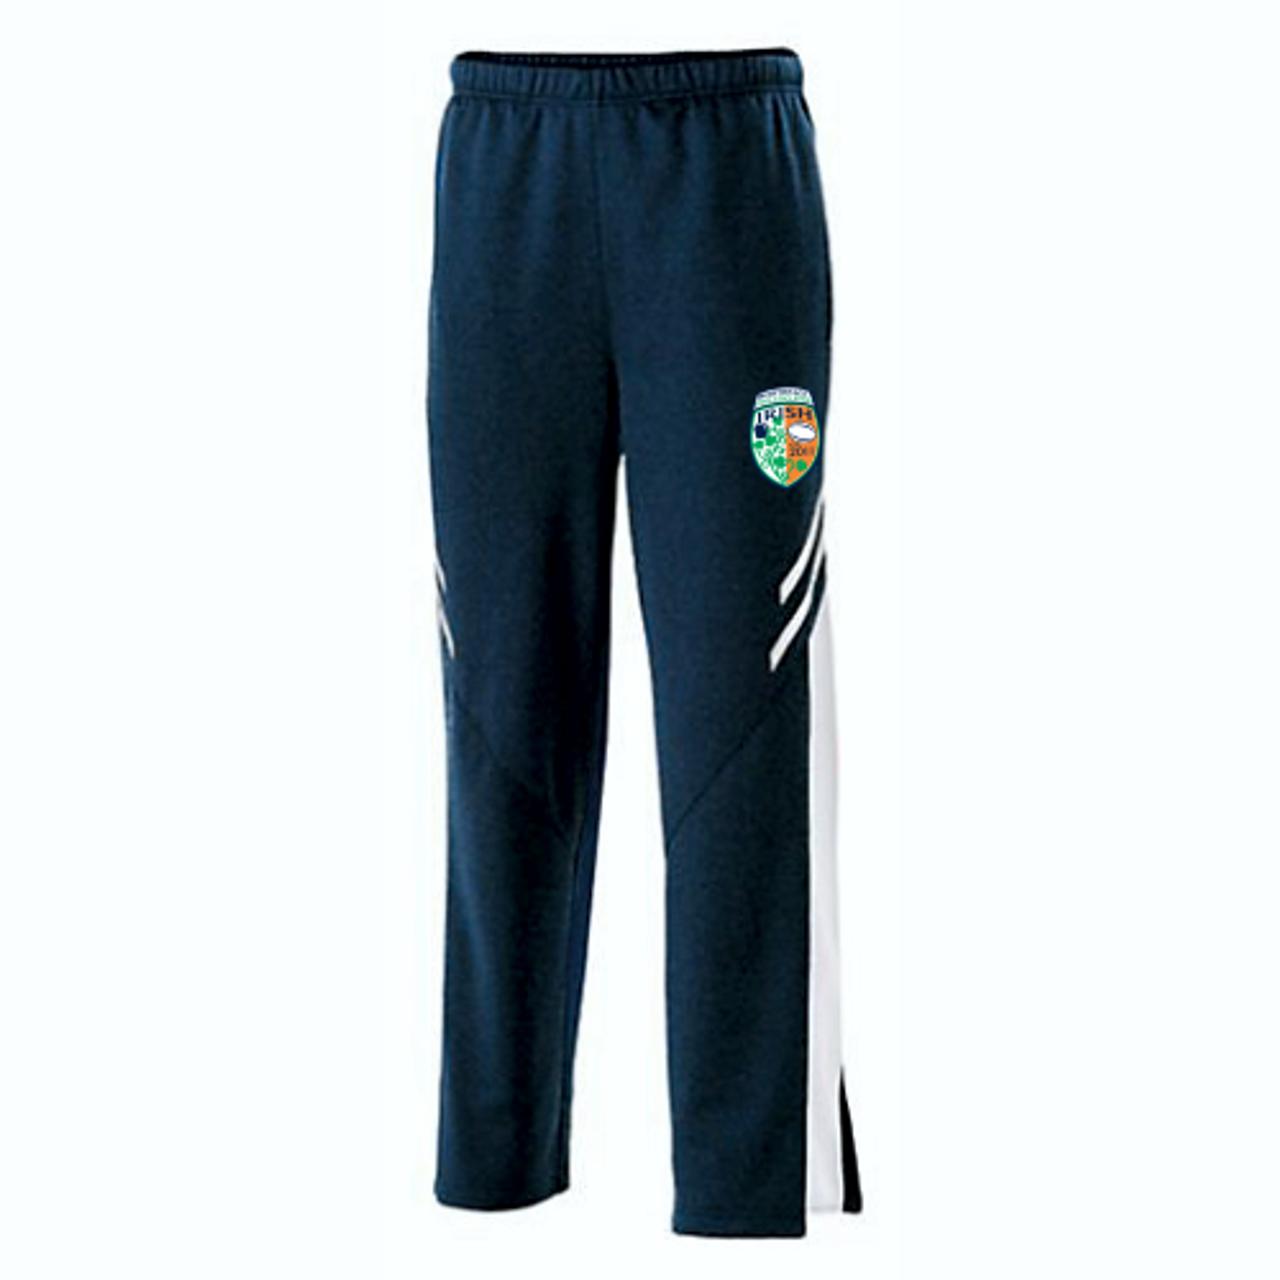 NEP Irish Fleece Pant